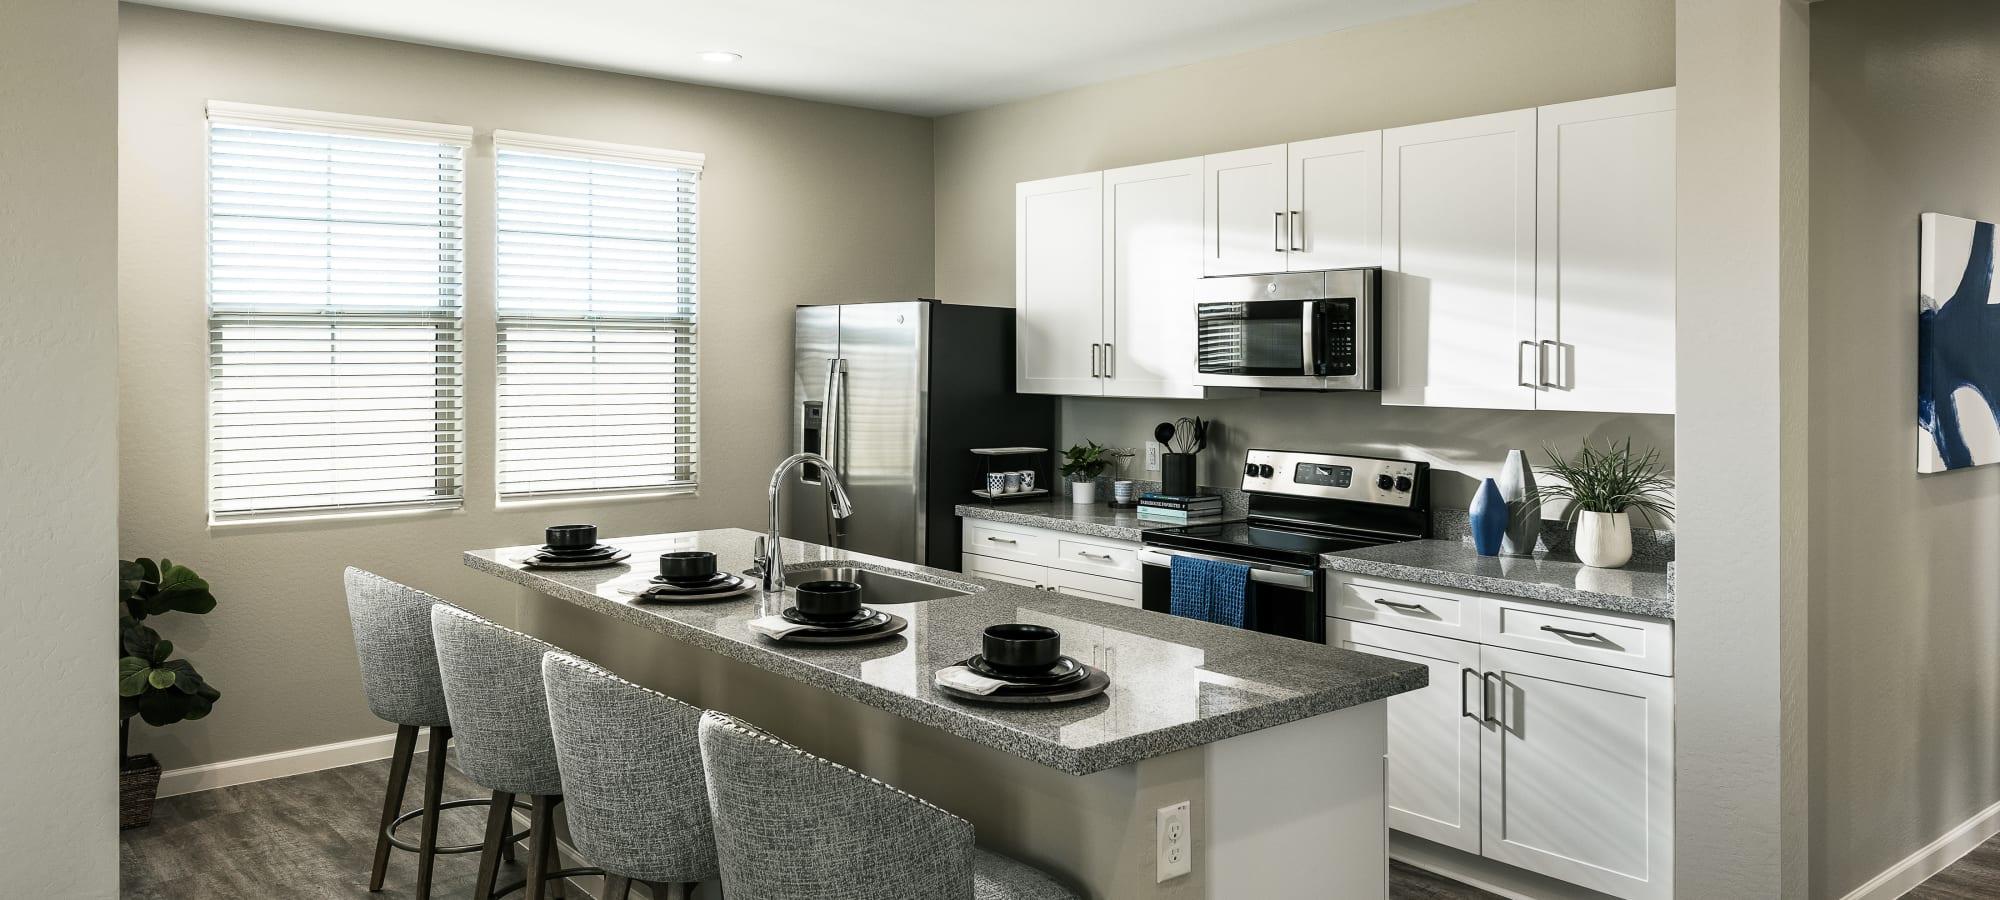 Kitchen at Las Casas at Windrose in Litchfield Park, Arizona